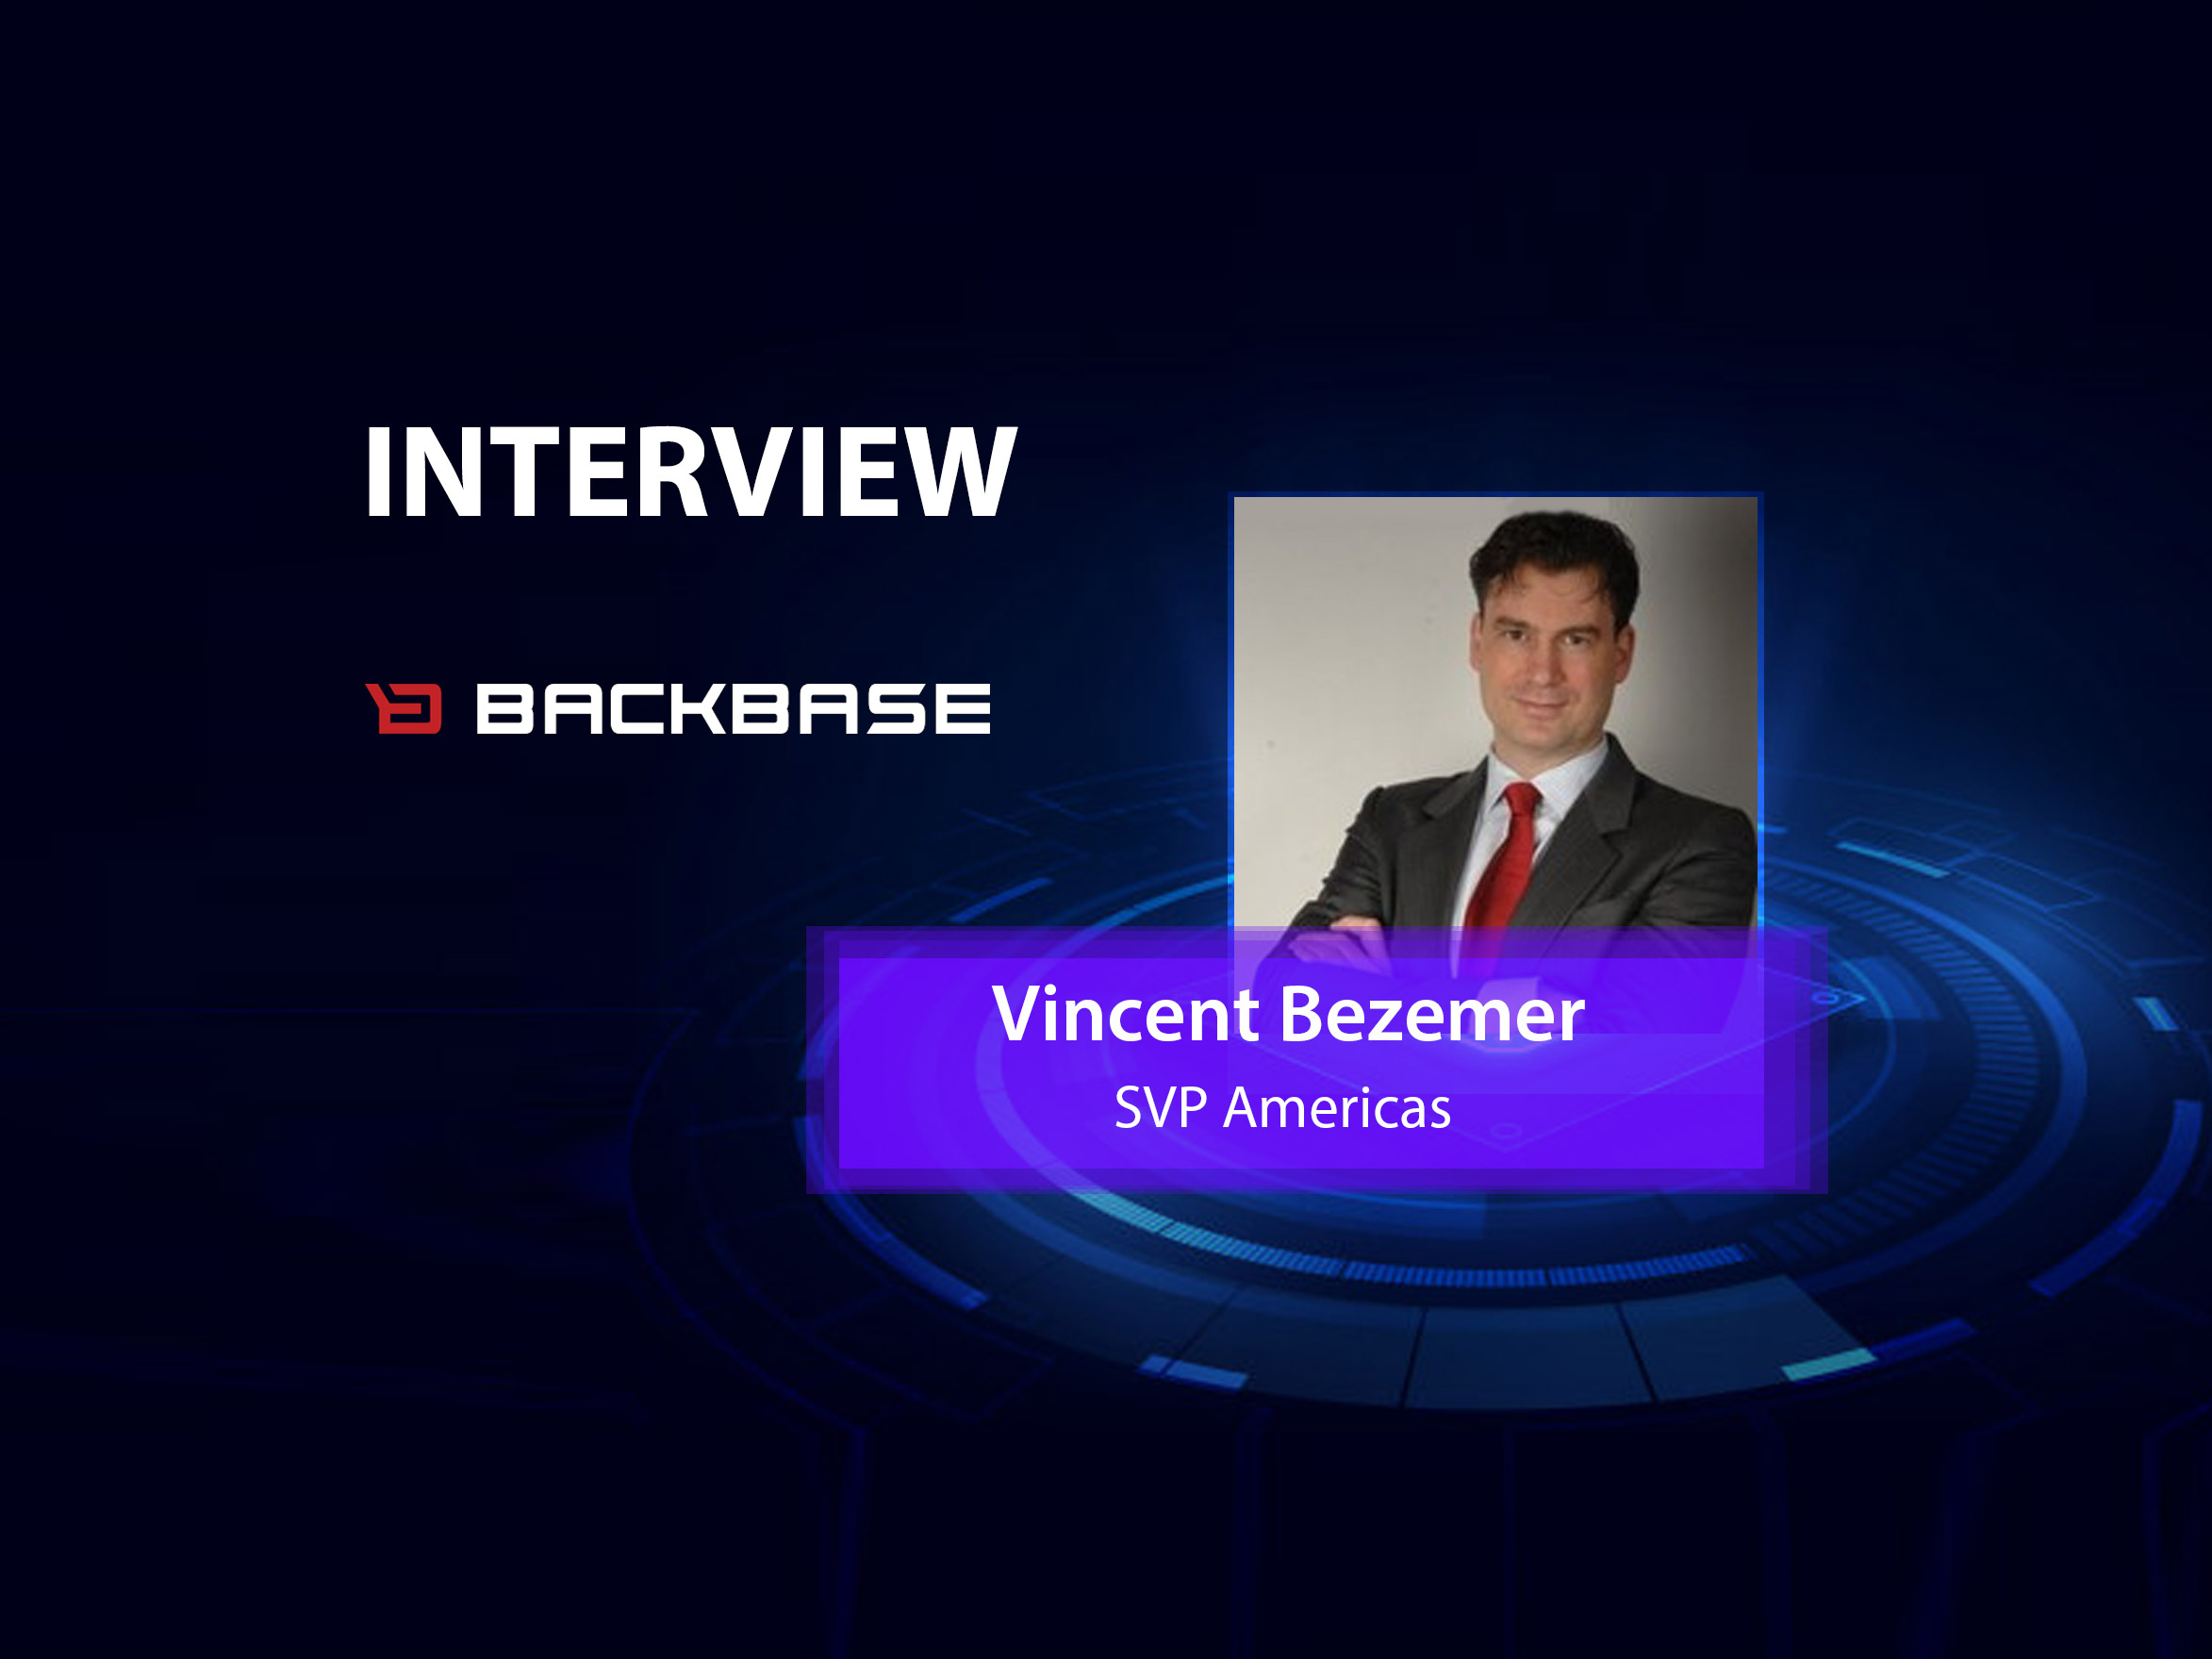 GlobalFintechSeries Interview with Vincent Bezemer, SVP Americas, Backbase